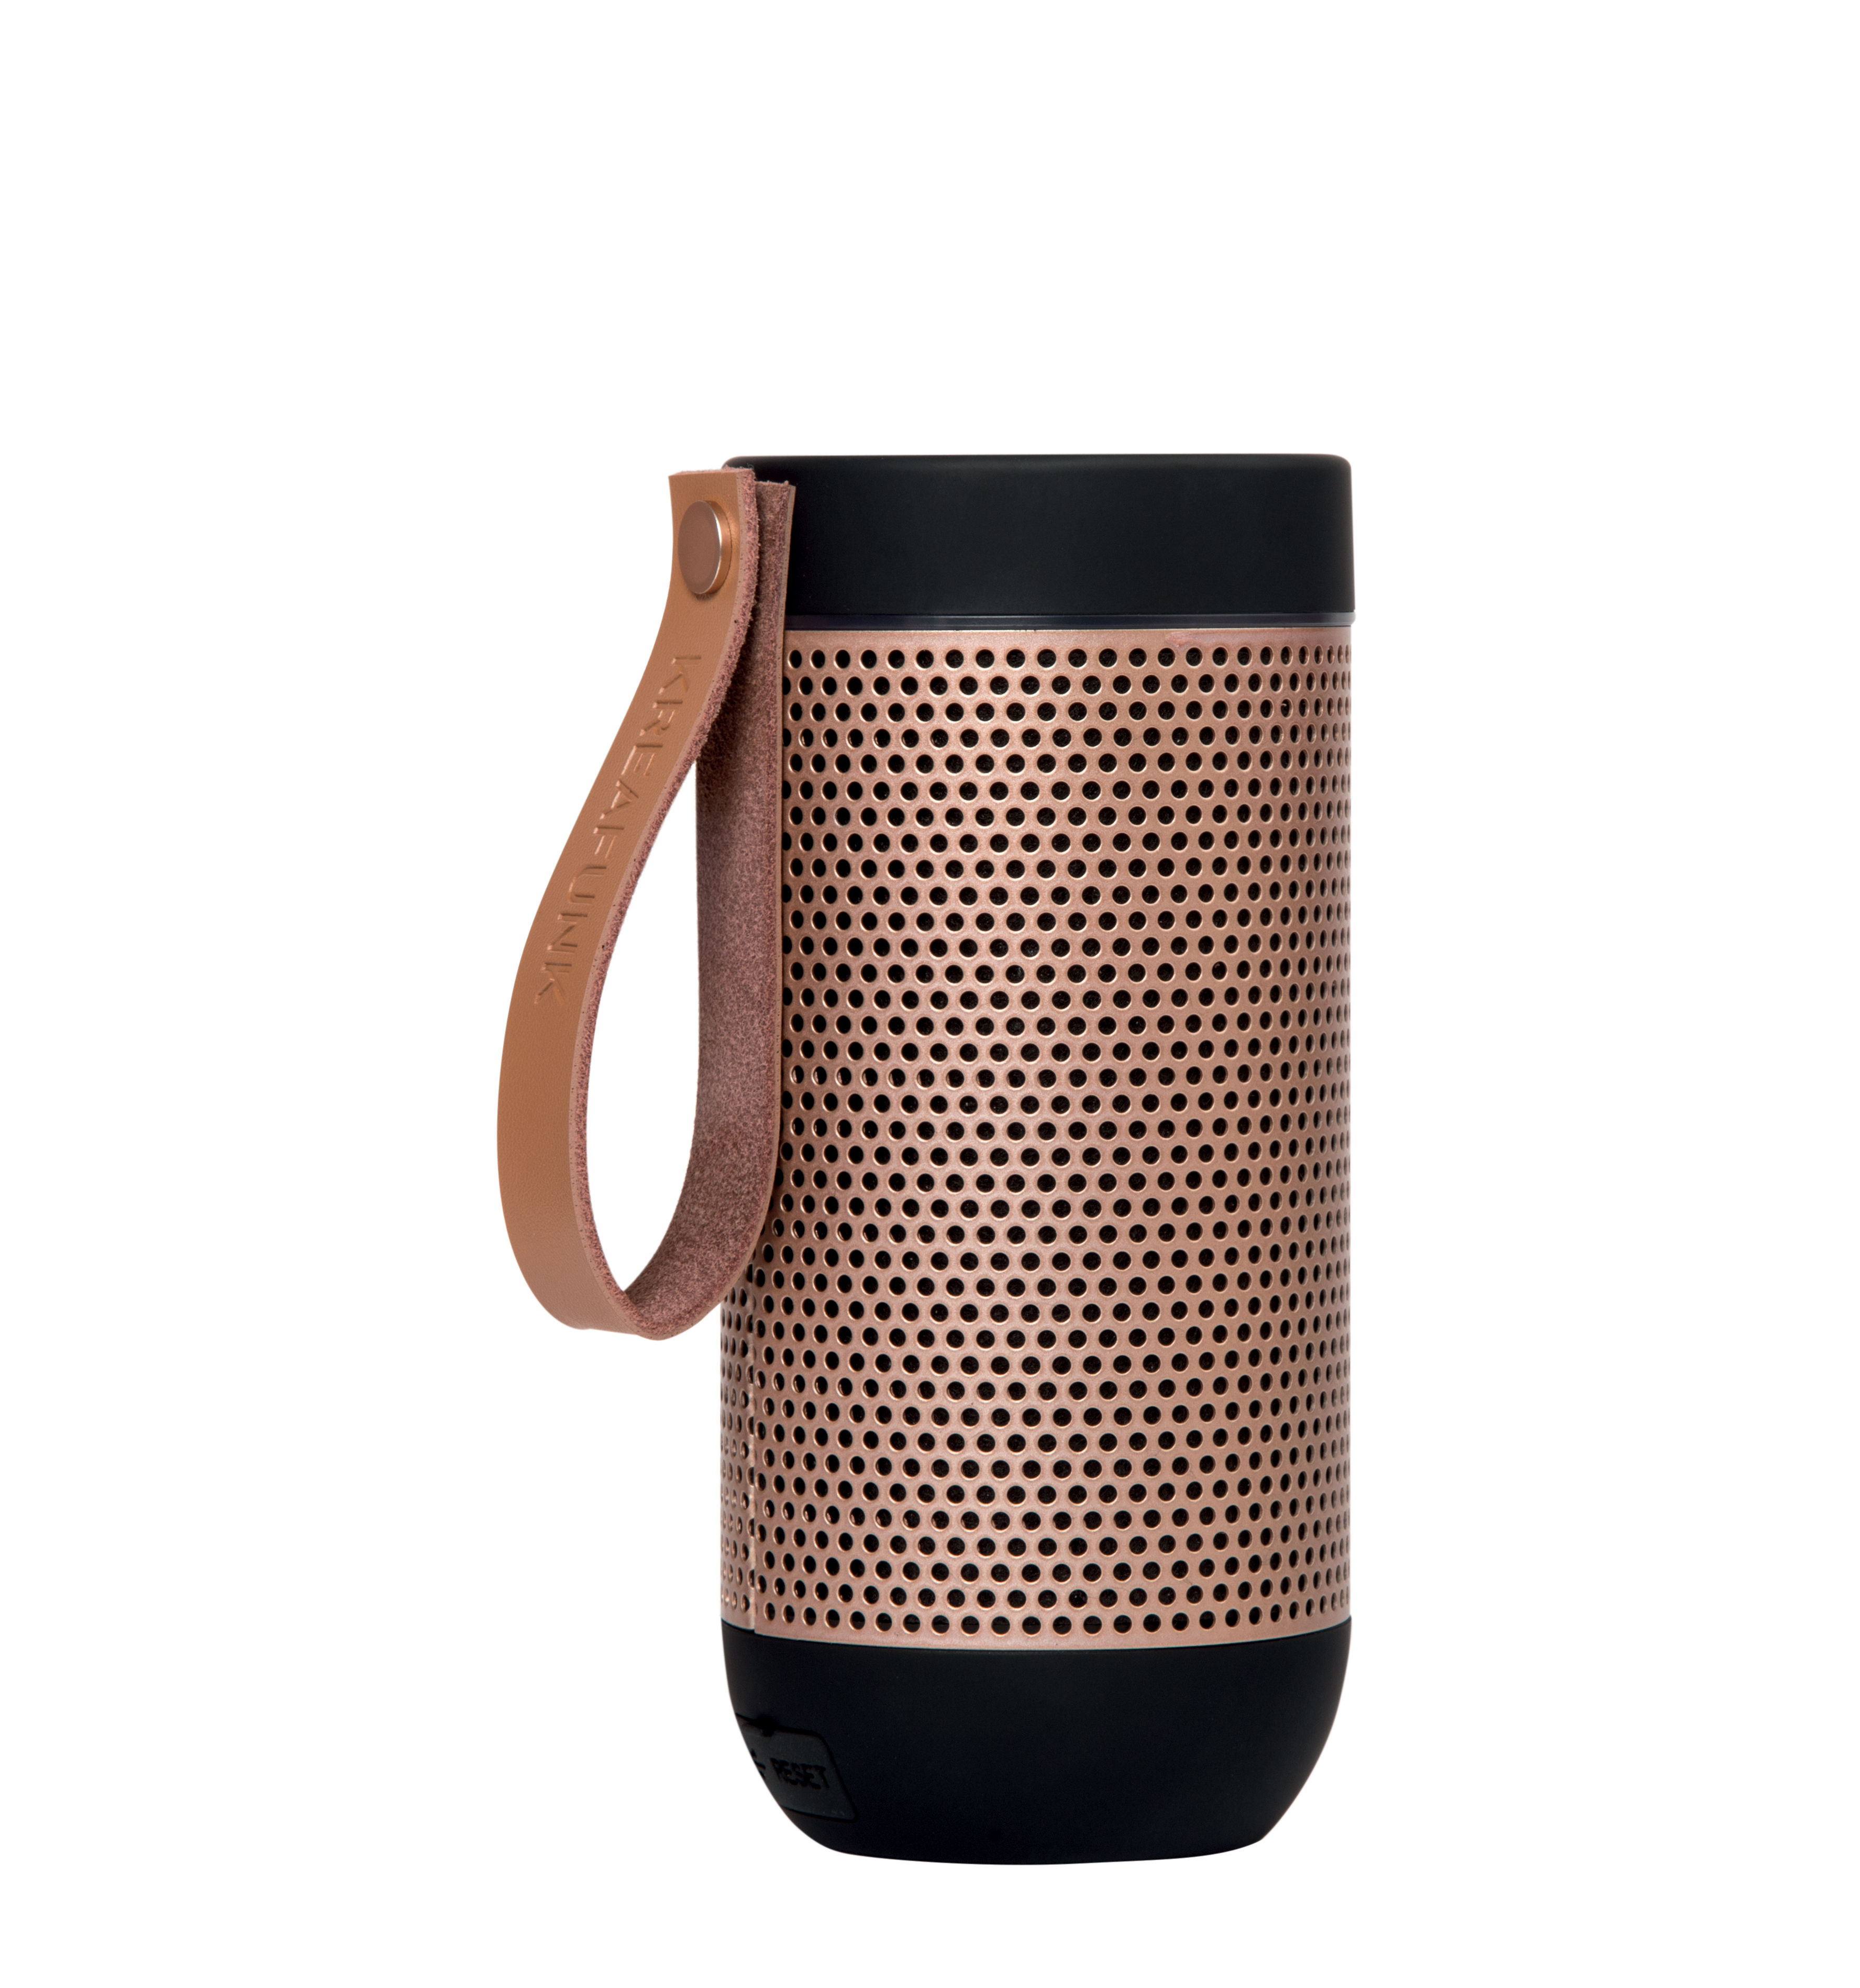 Accessories - Speakers & Audio - aFUNK Bluetooth speaker - / Portable - Wireless by Kreafunk - Black /  Rose gold - Aluminium, Leather, Plastic material